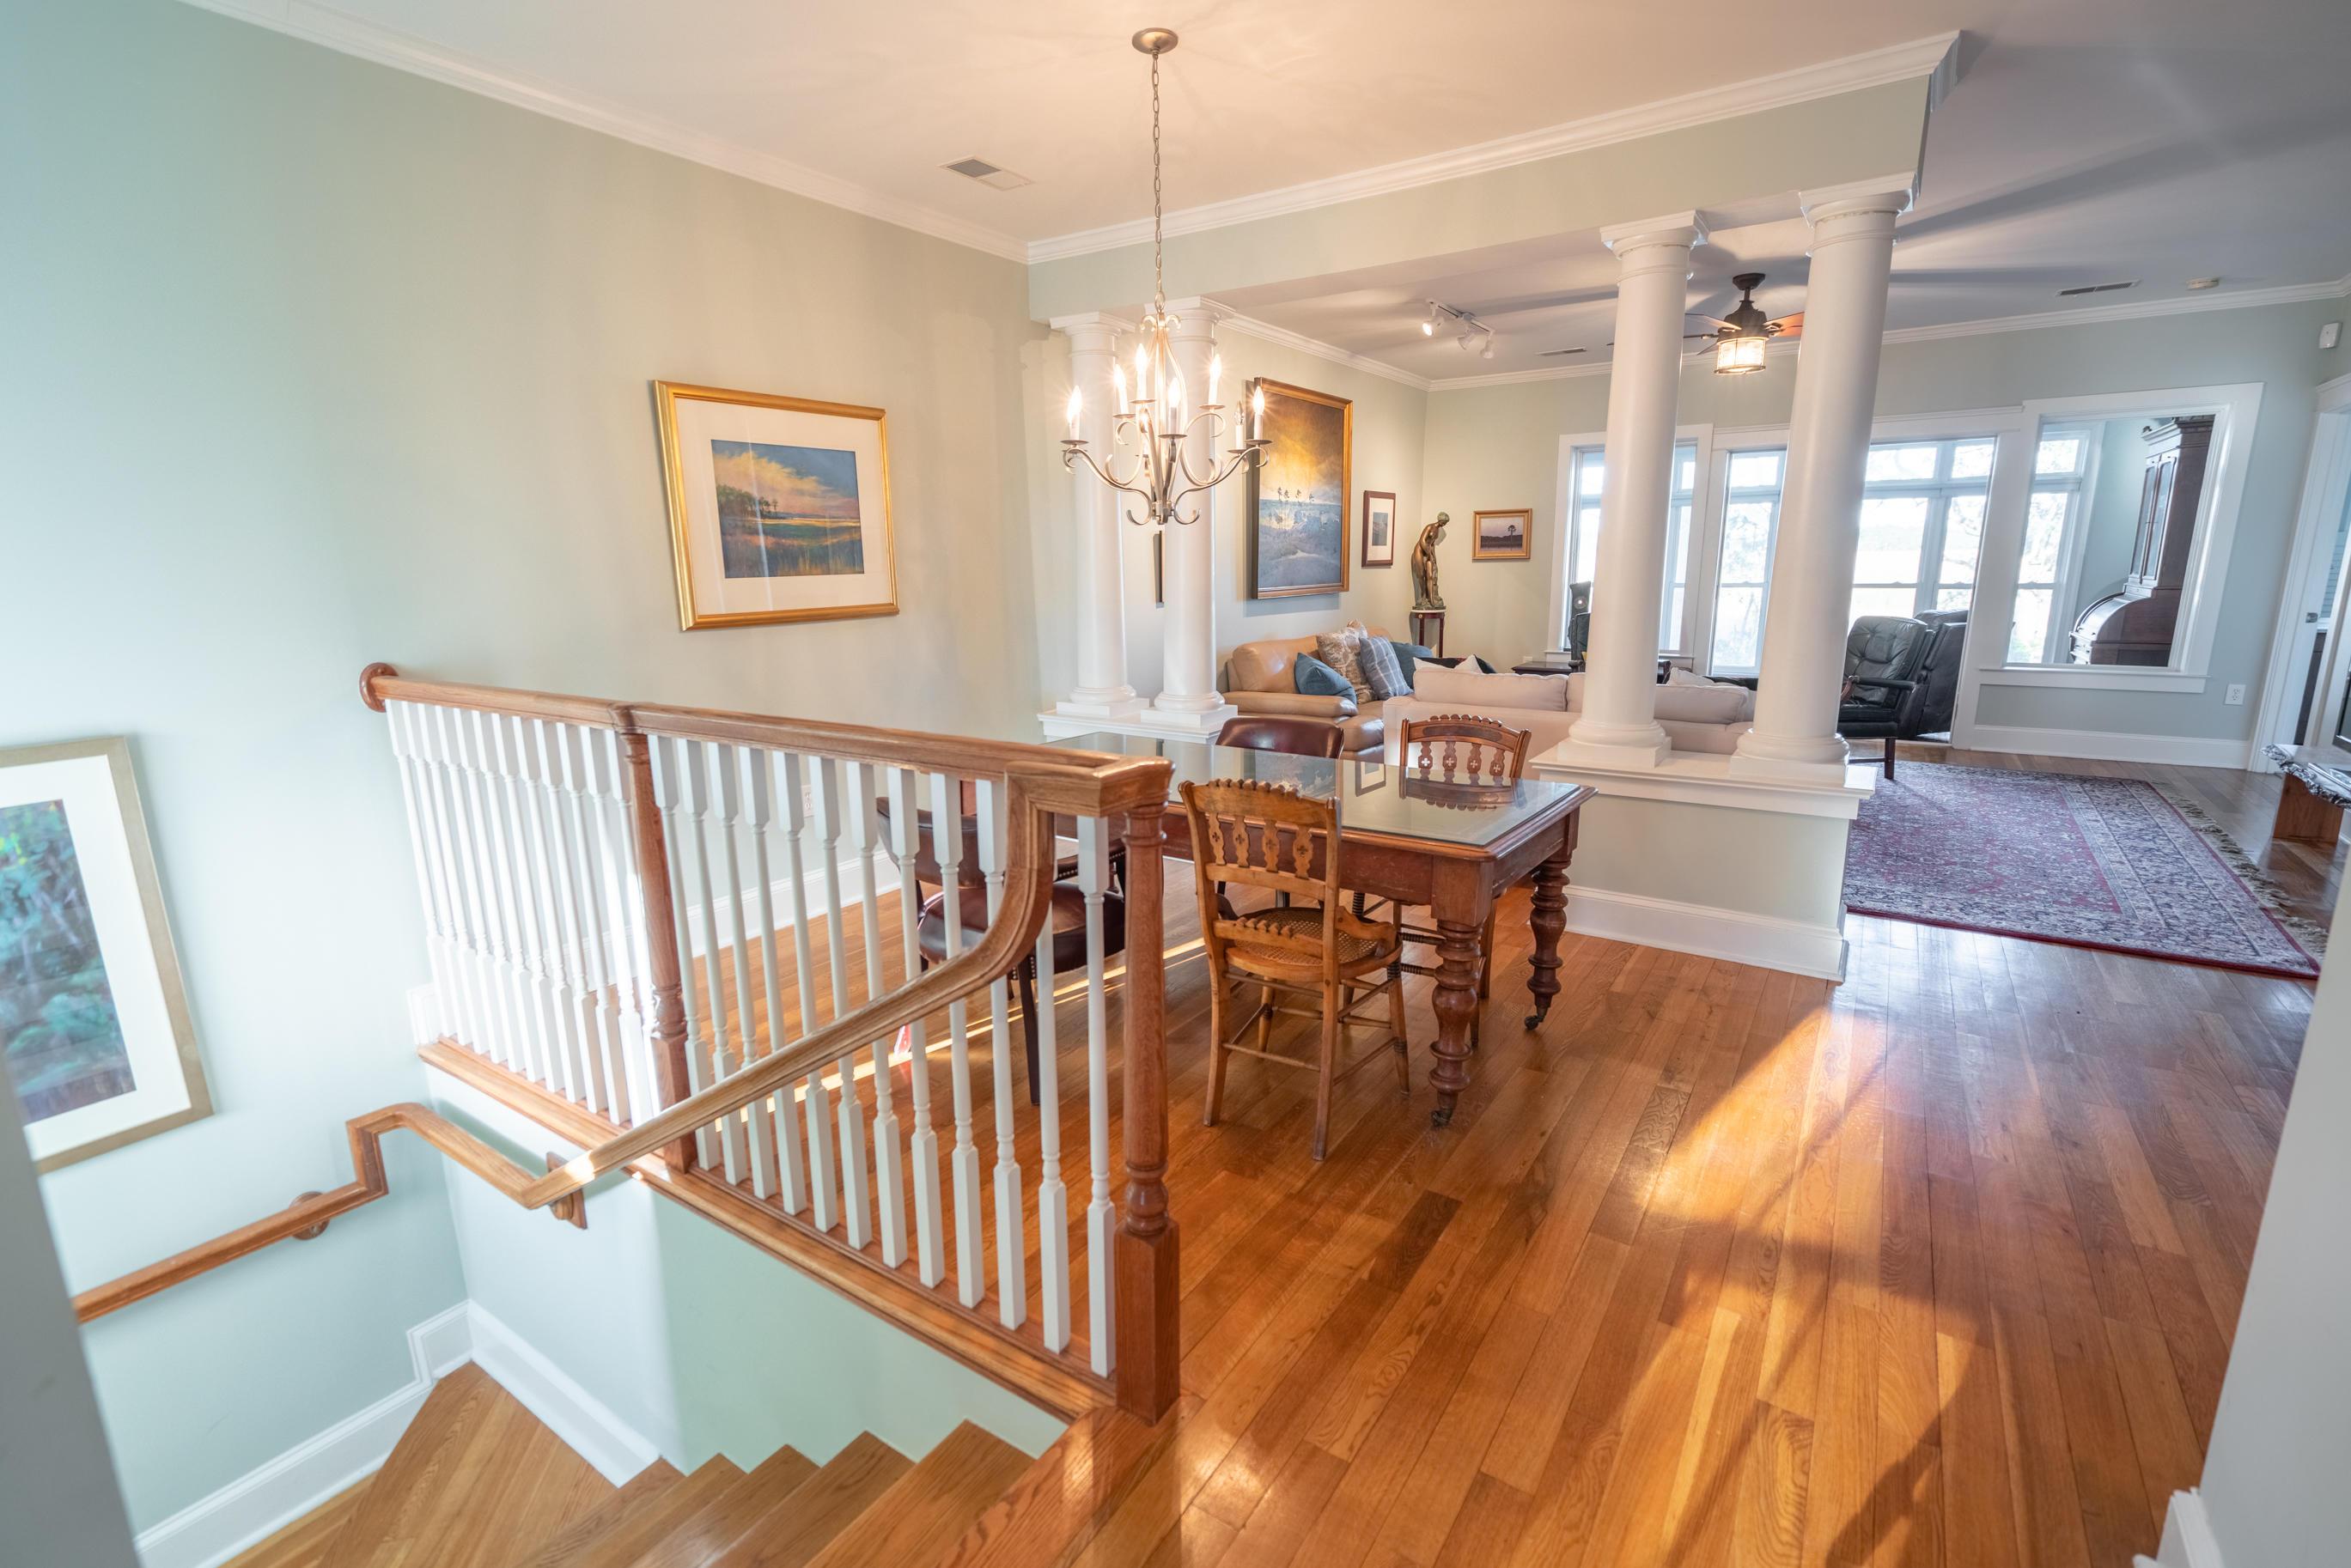 Etiwan Pointe Homes For Sale - 132 Winding Creek, Mount Pleasant, SC - 27